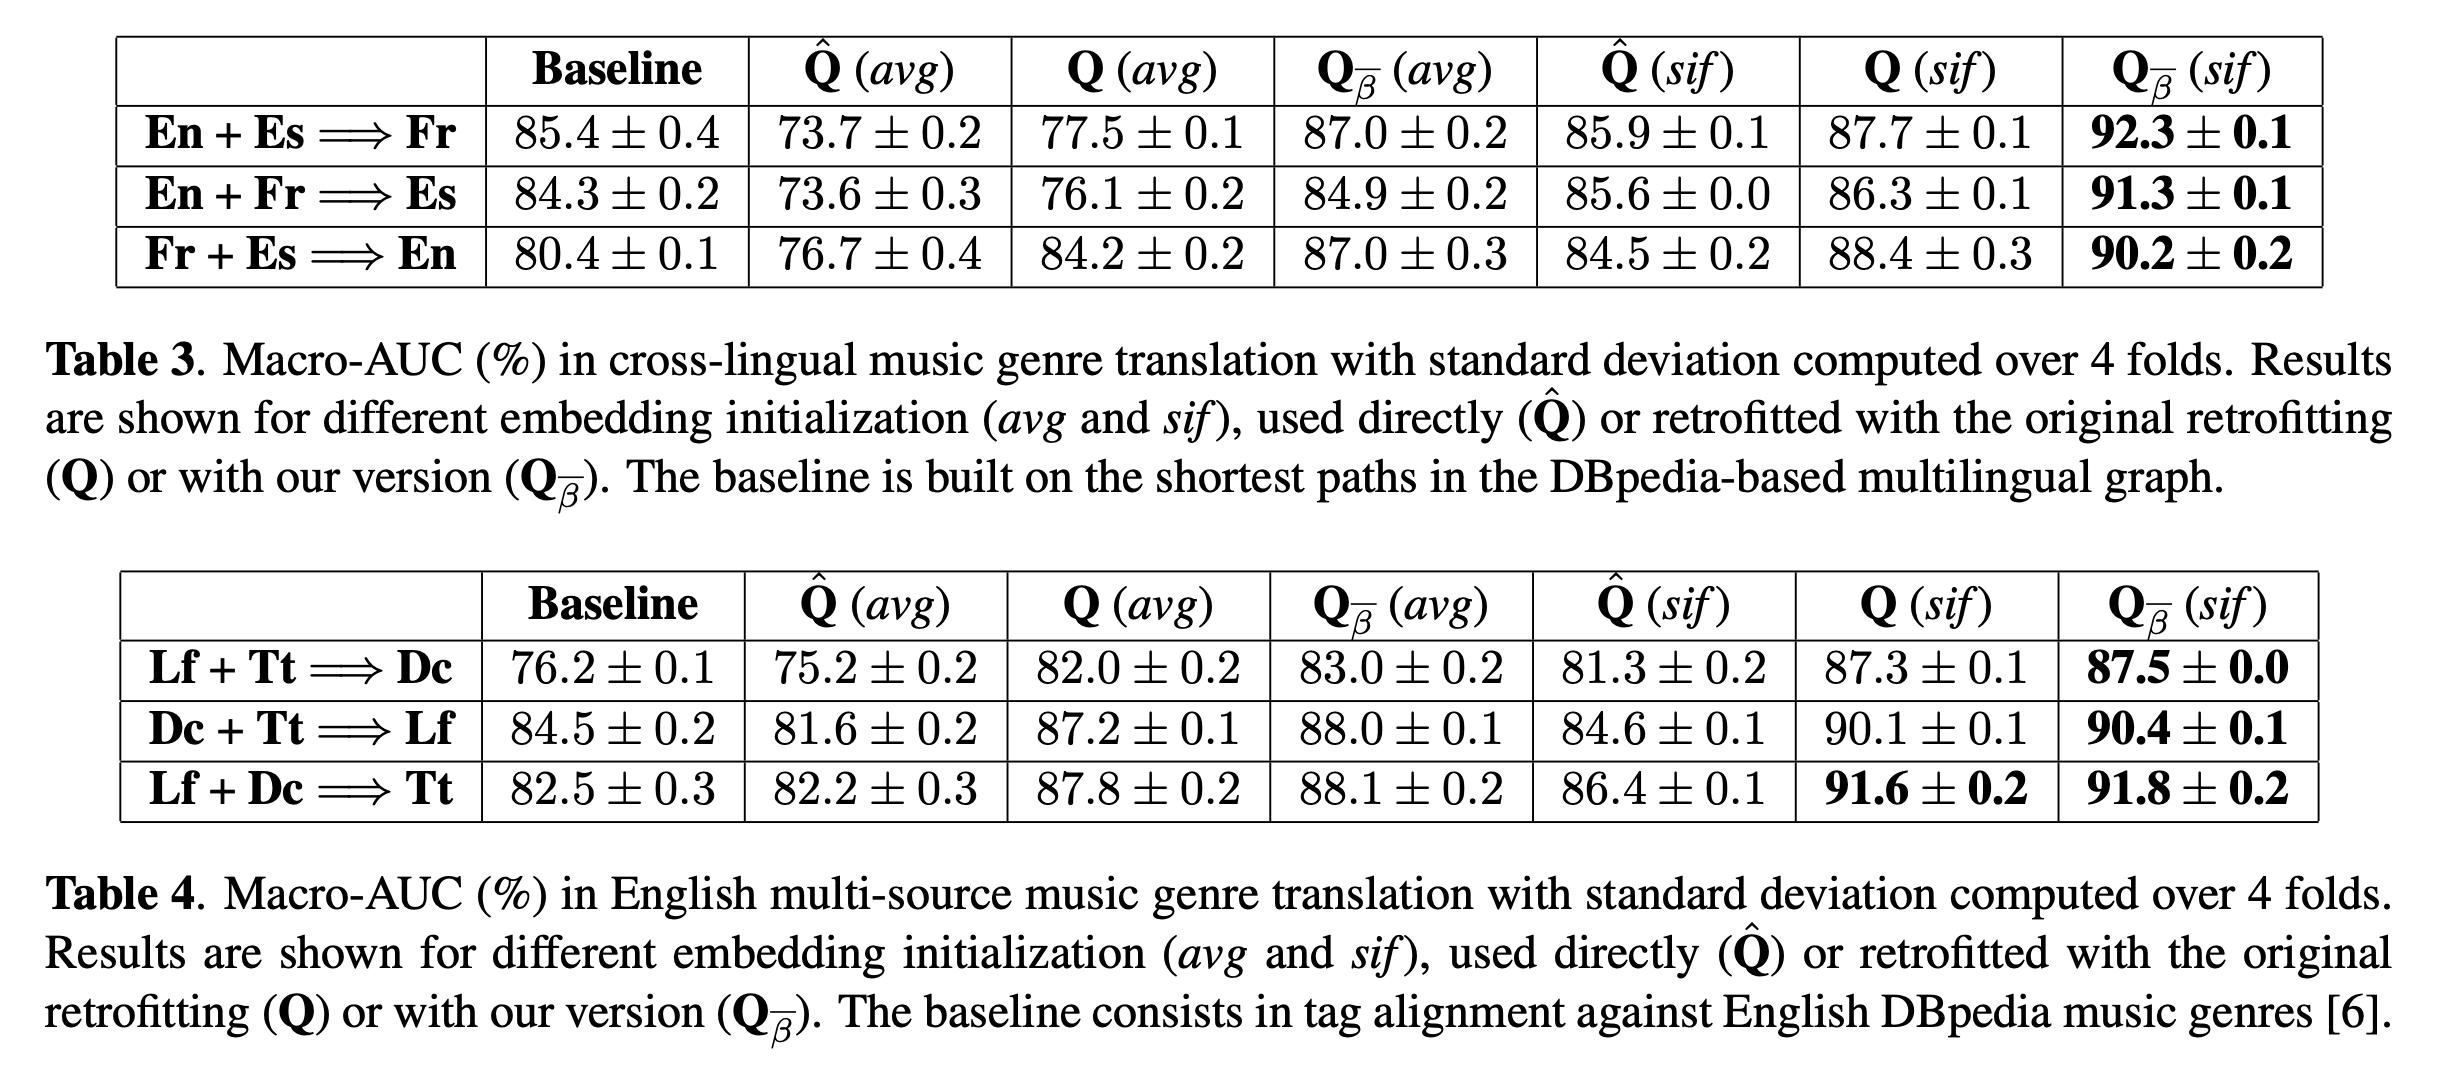 Macro-AUC scores in music genre translation